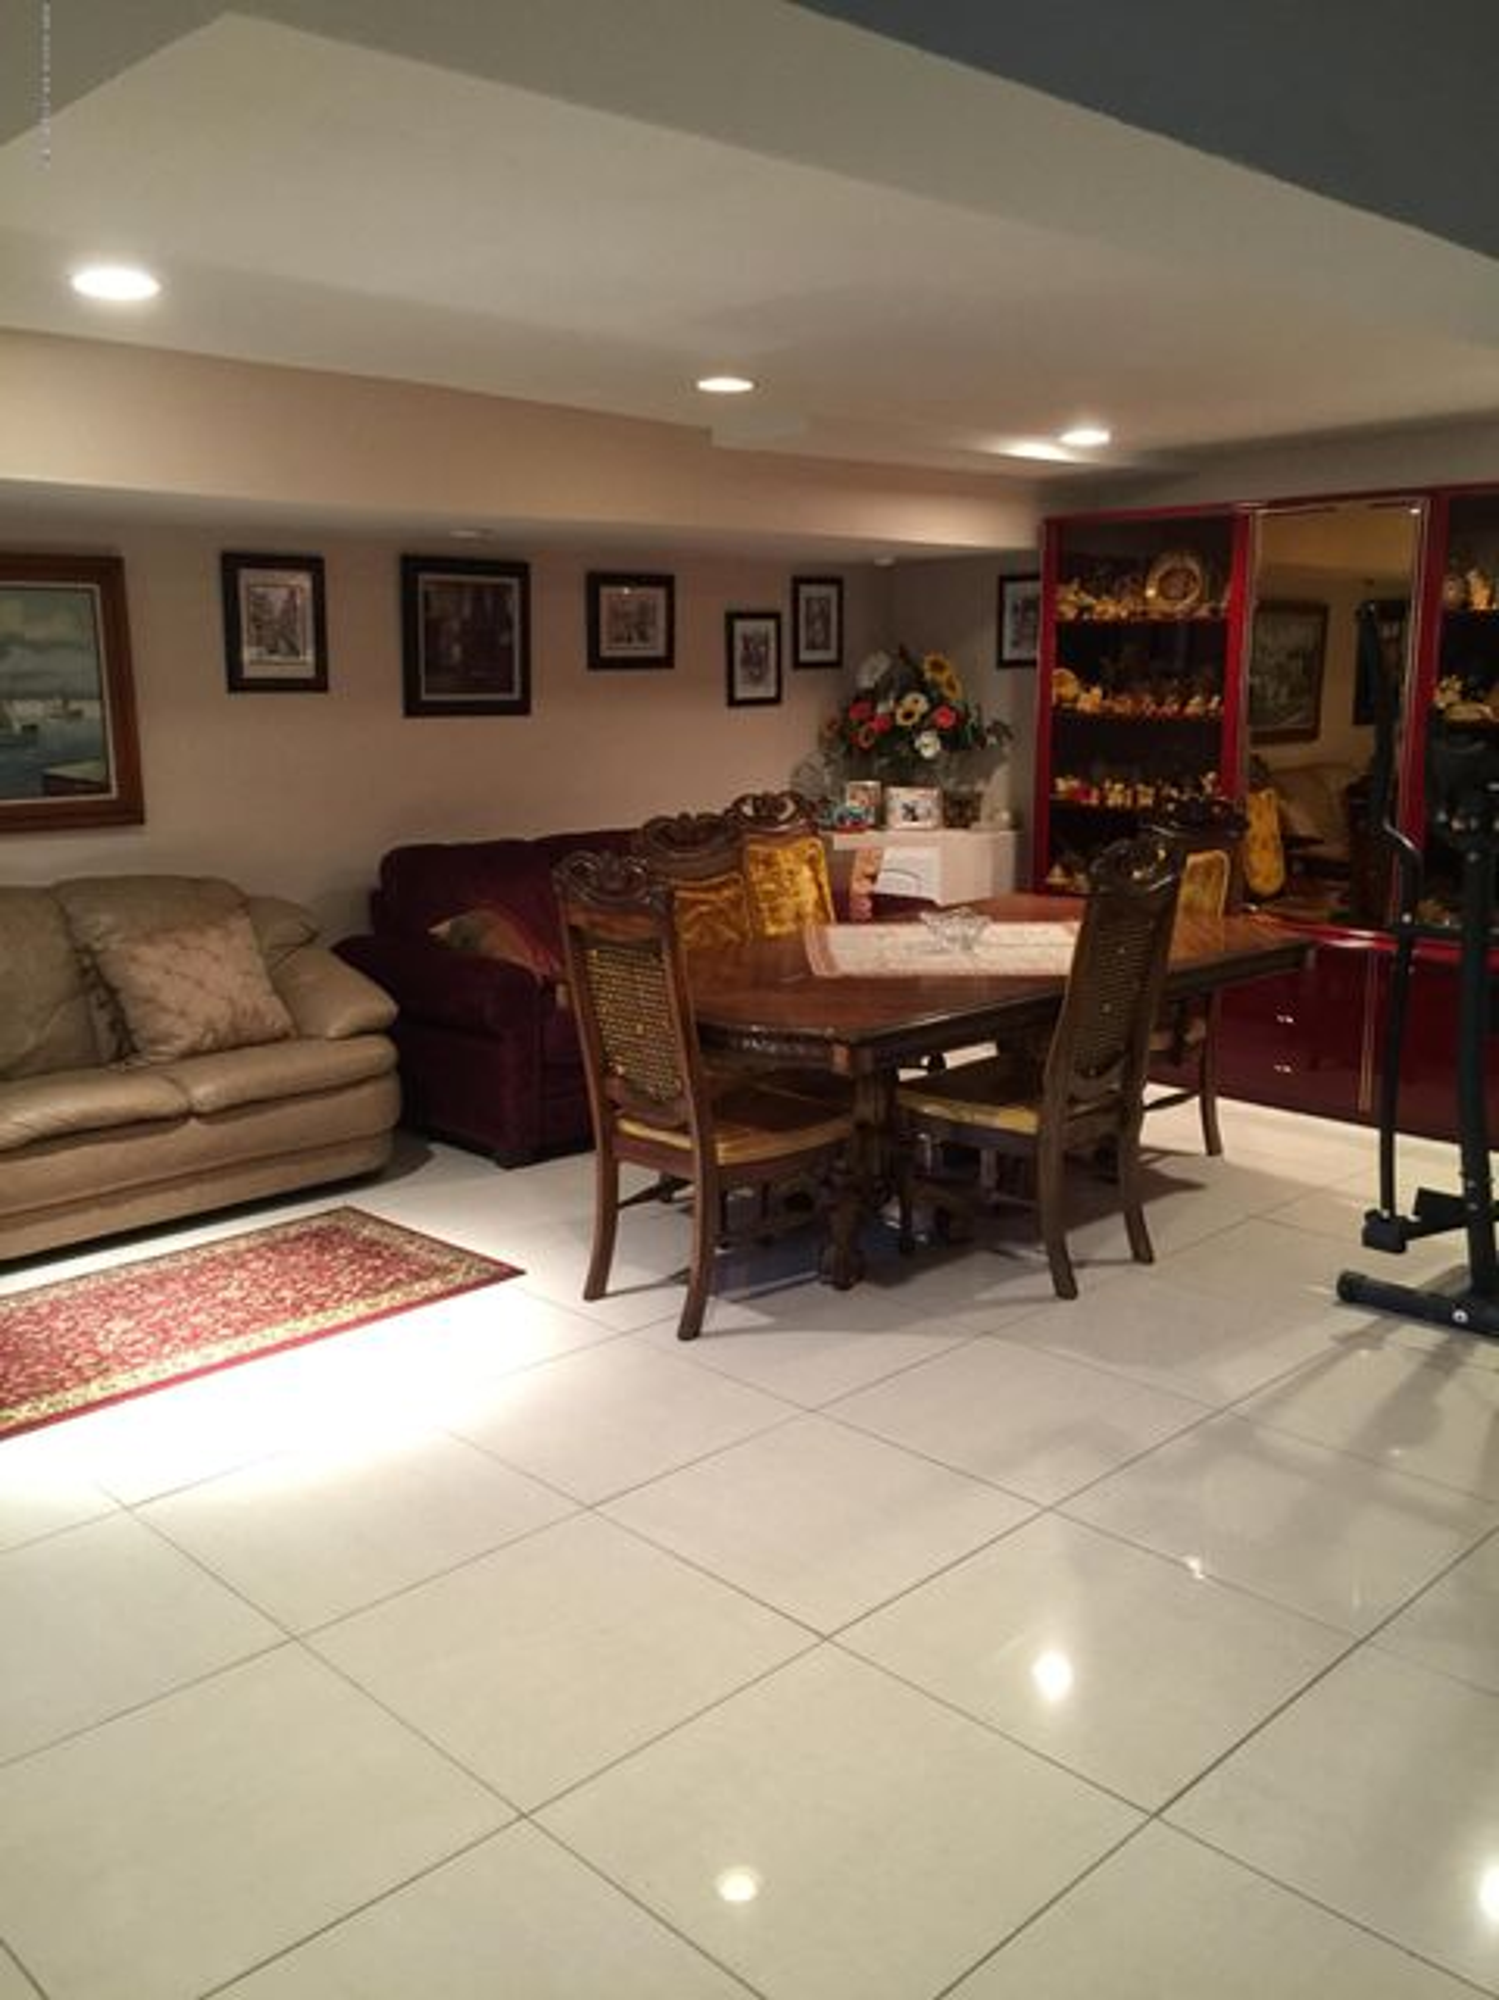 Single Family - Detached 108 Clarke Avenue  Staten Island, NY 10306, MLS-1106455-39